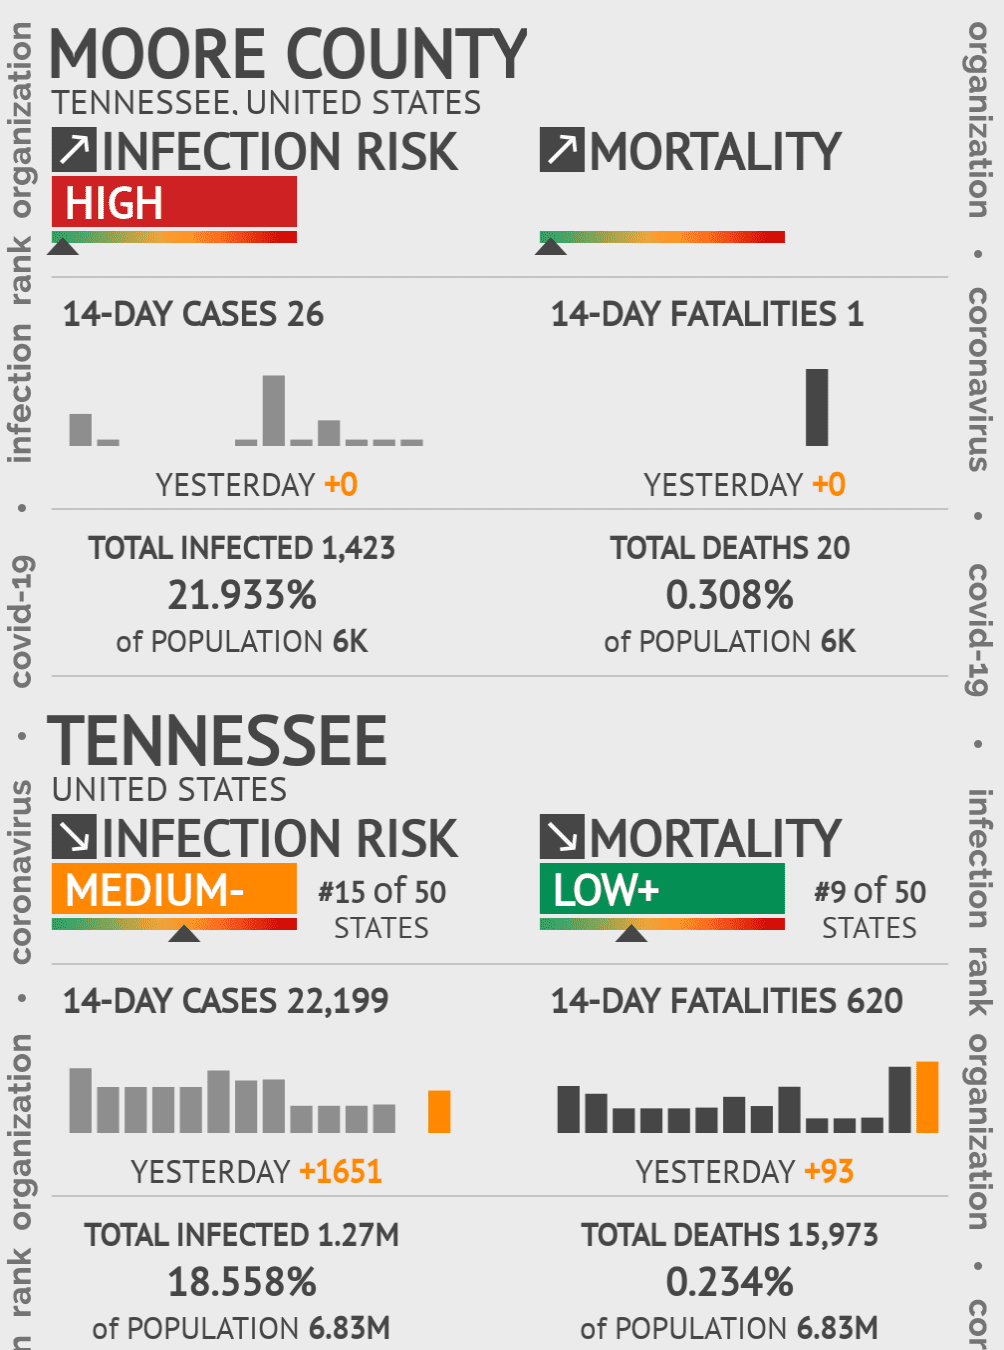 Moore County Coronavirus Covid-19 Risk of Infection on November 25, 2020